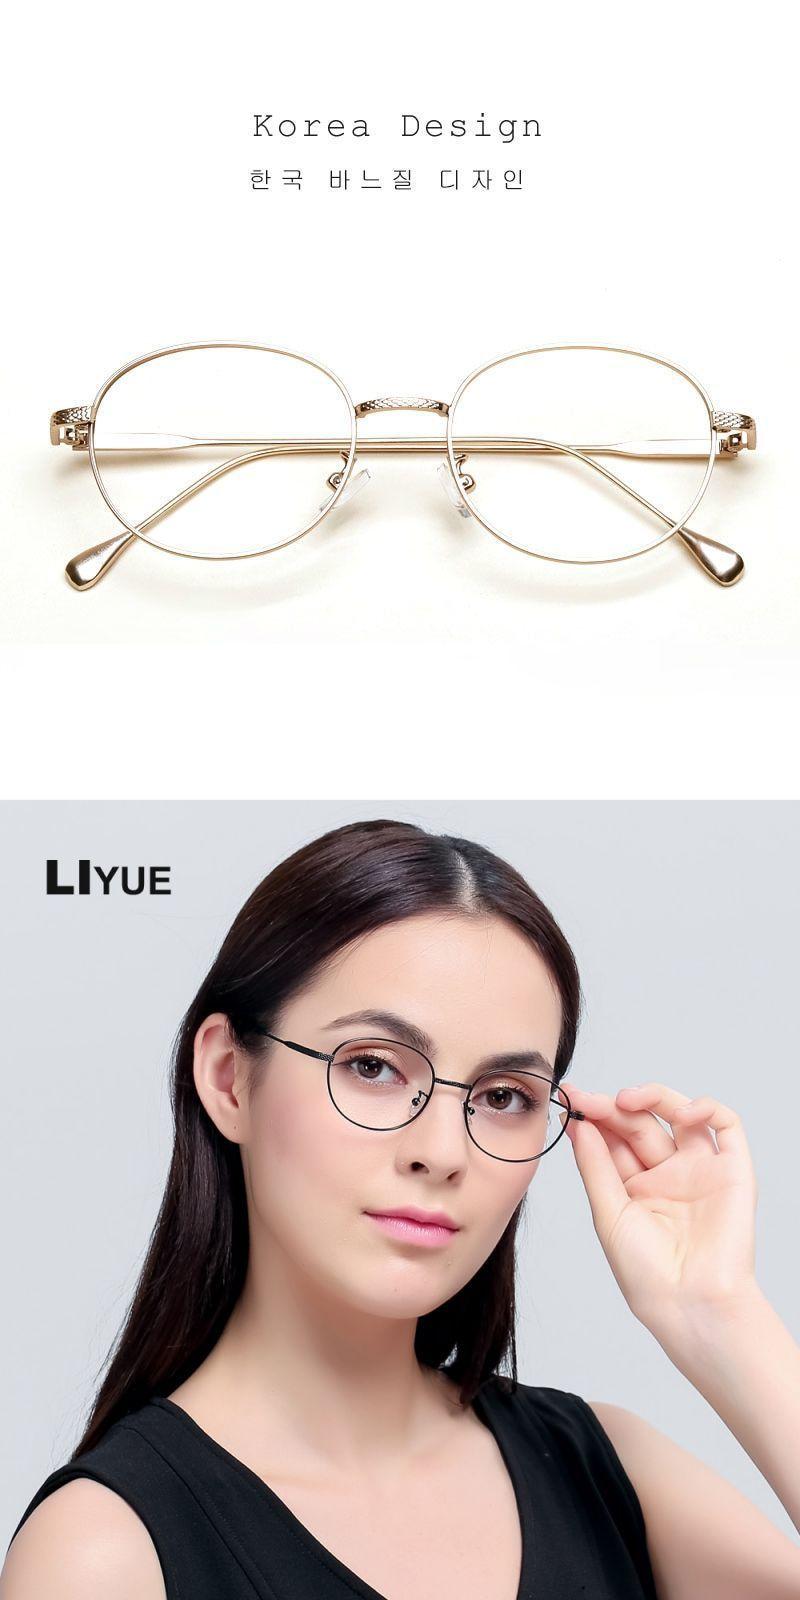 080b1679cbd4 Liyue vintage round metal glasses female spectacles frame men gold eyewear  frame glasses clear lens optical